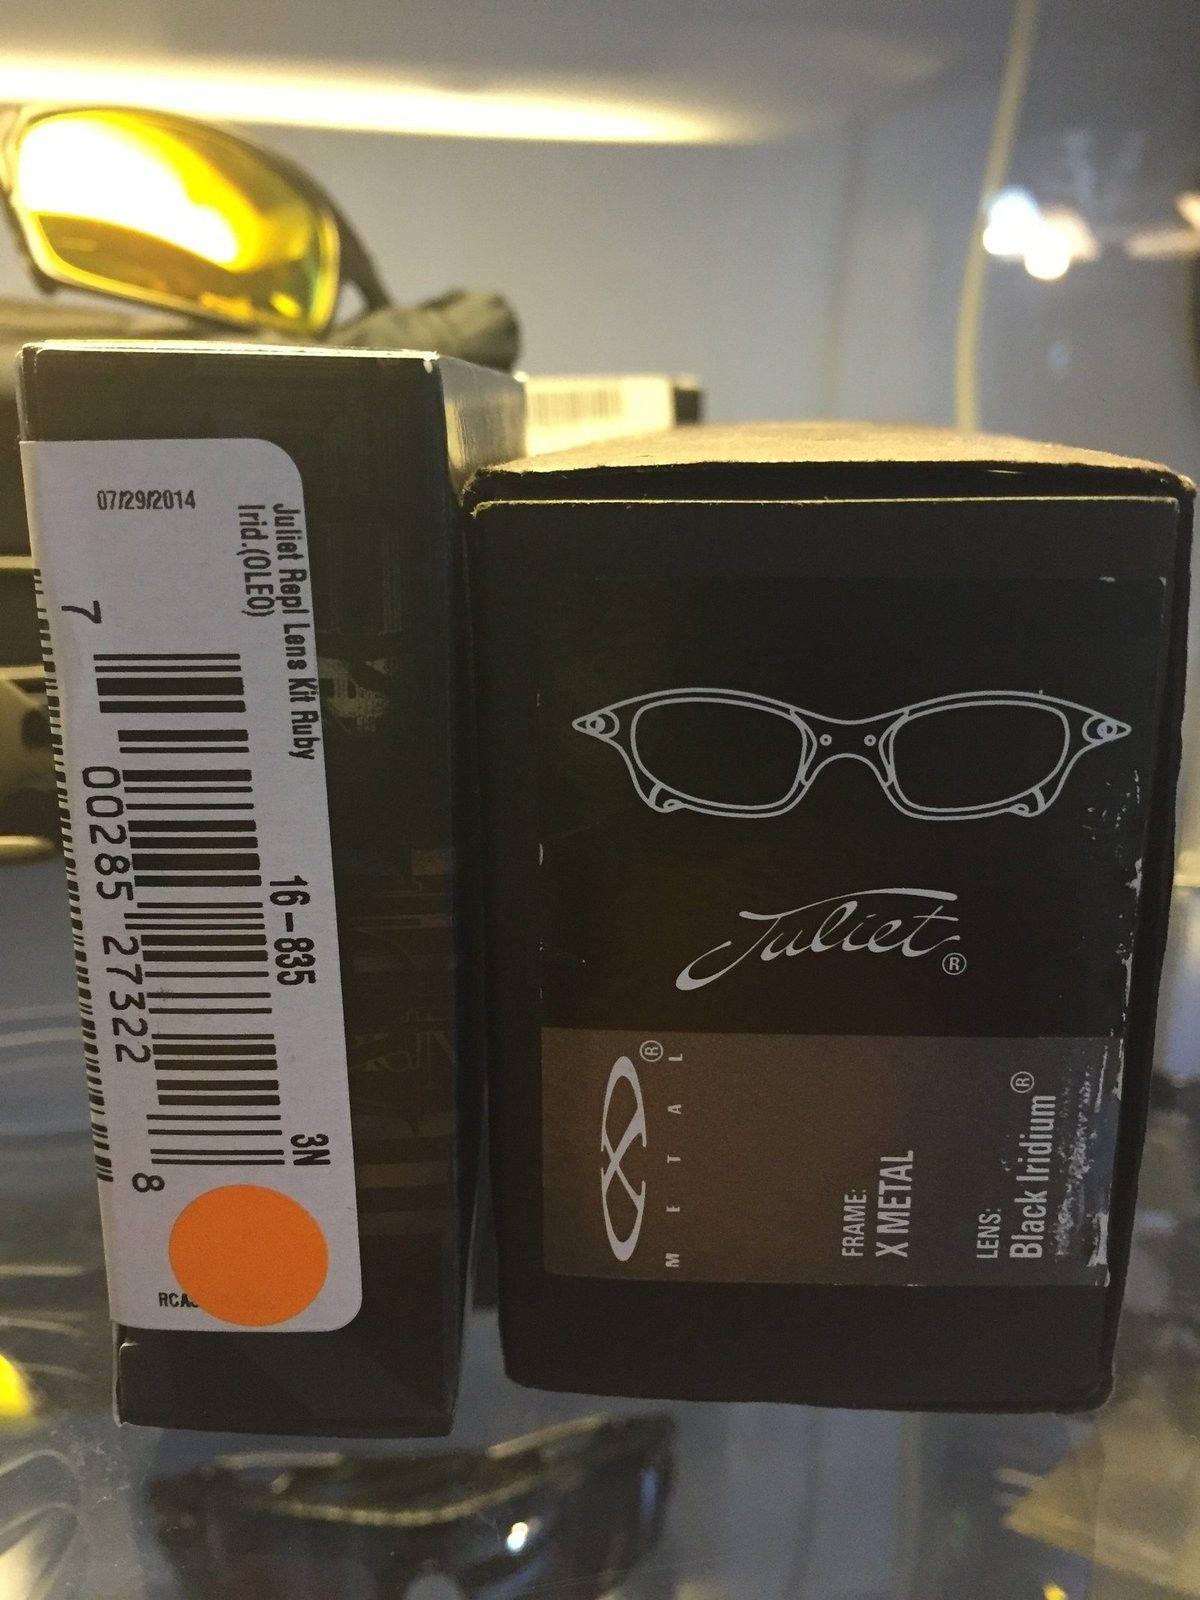 Juliet x metal/ black iridium with extra Ruby lenses - image.jpg